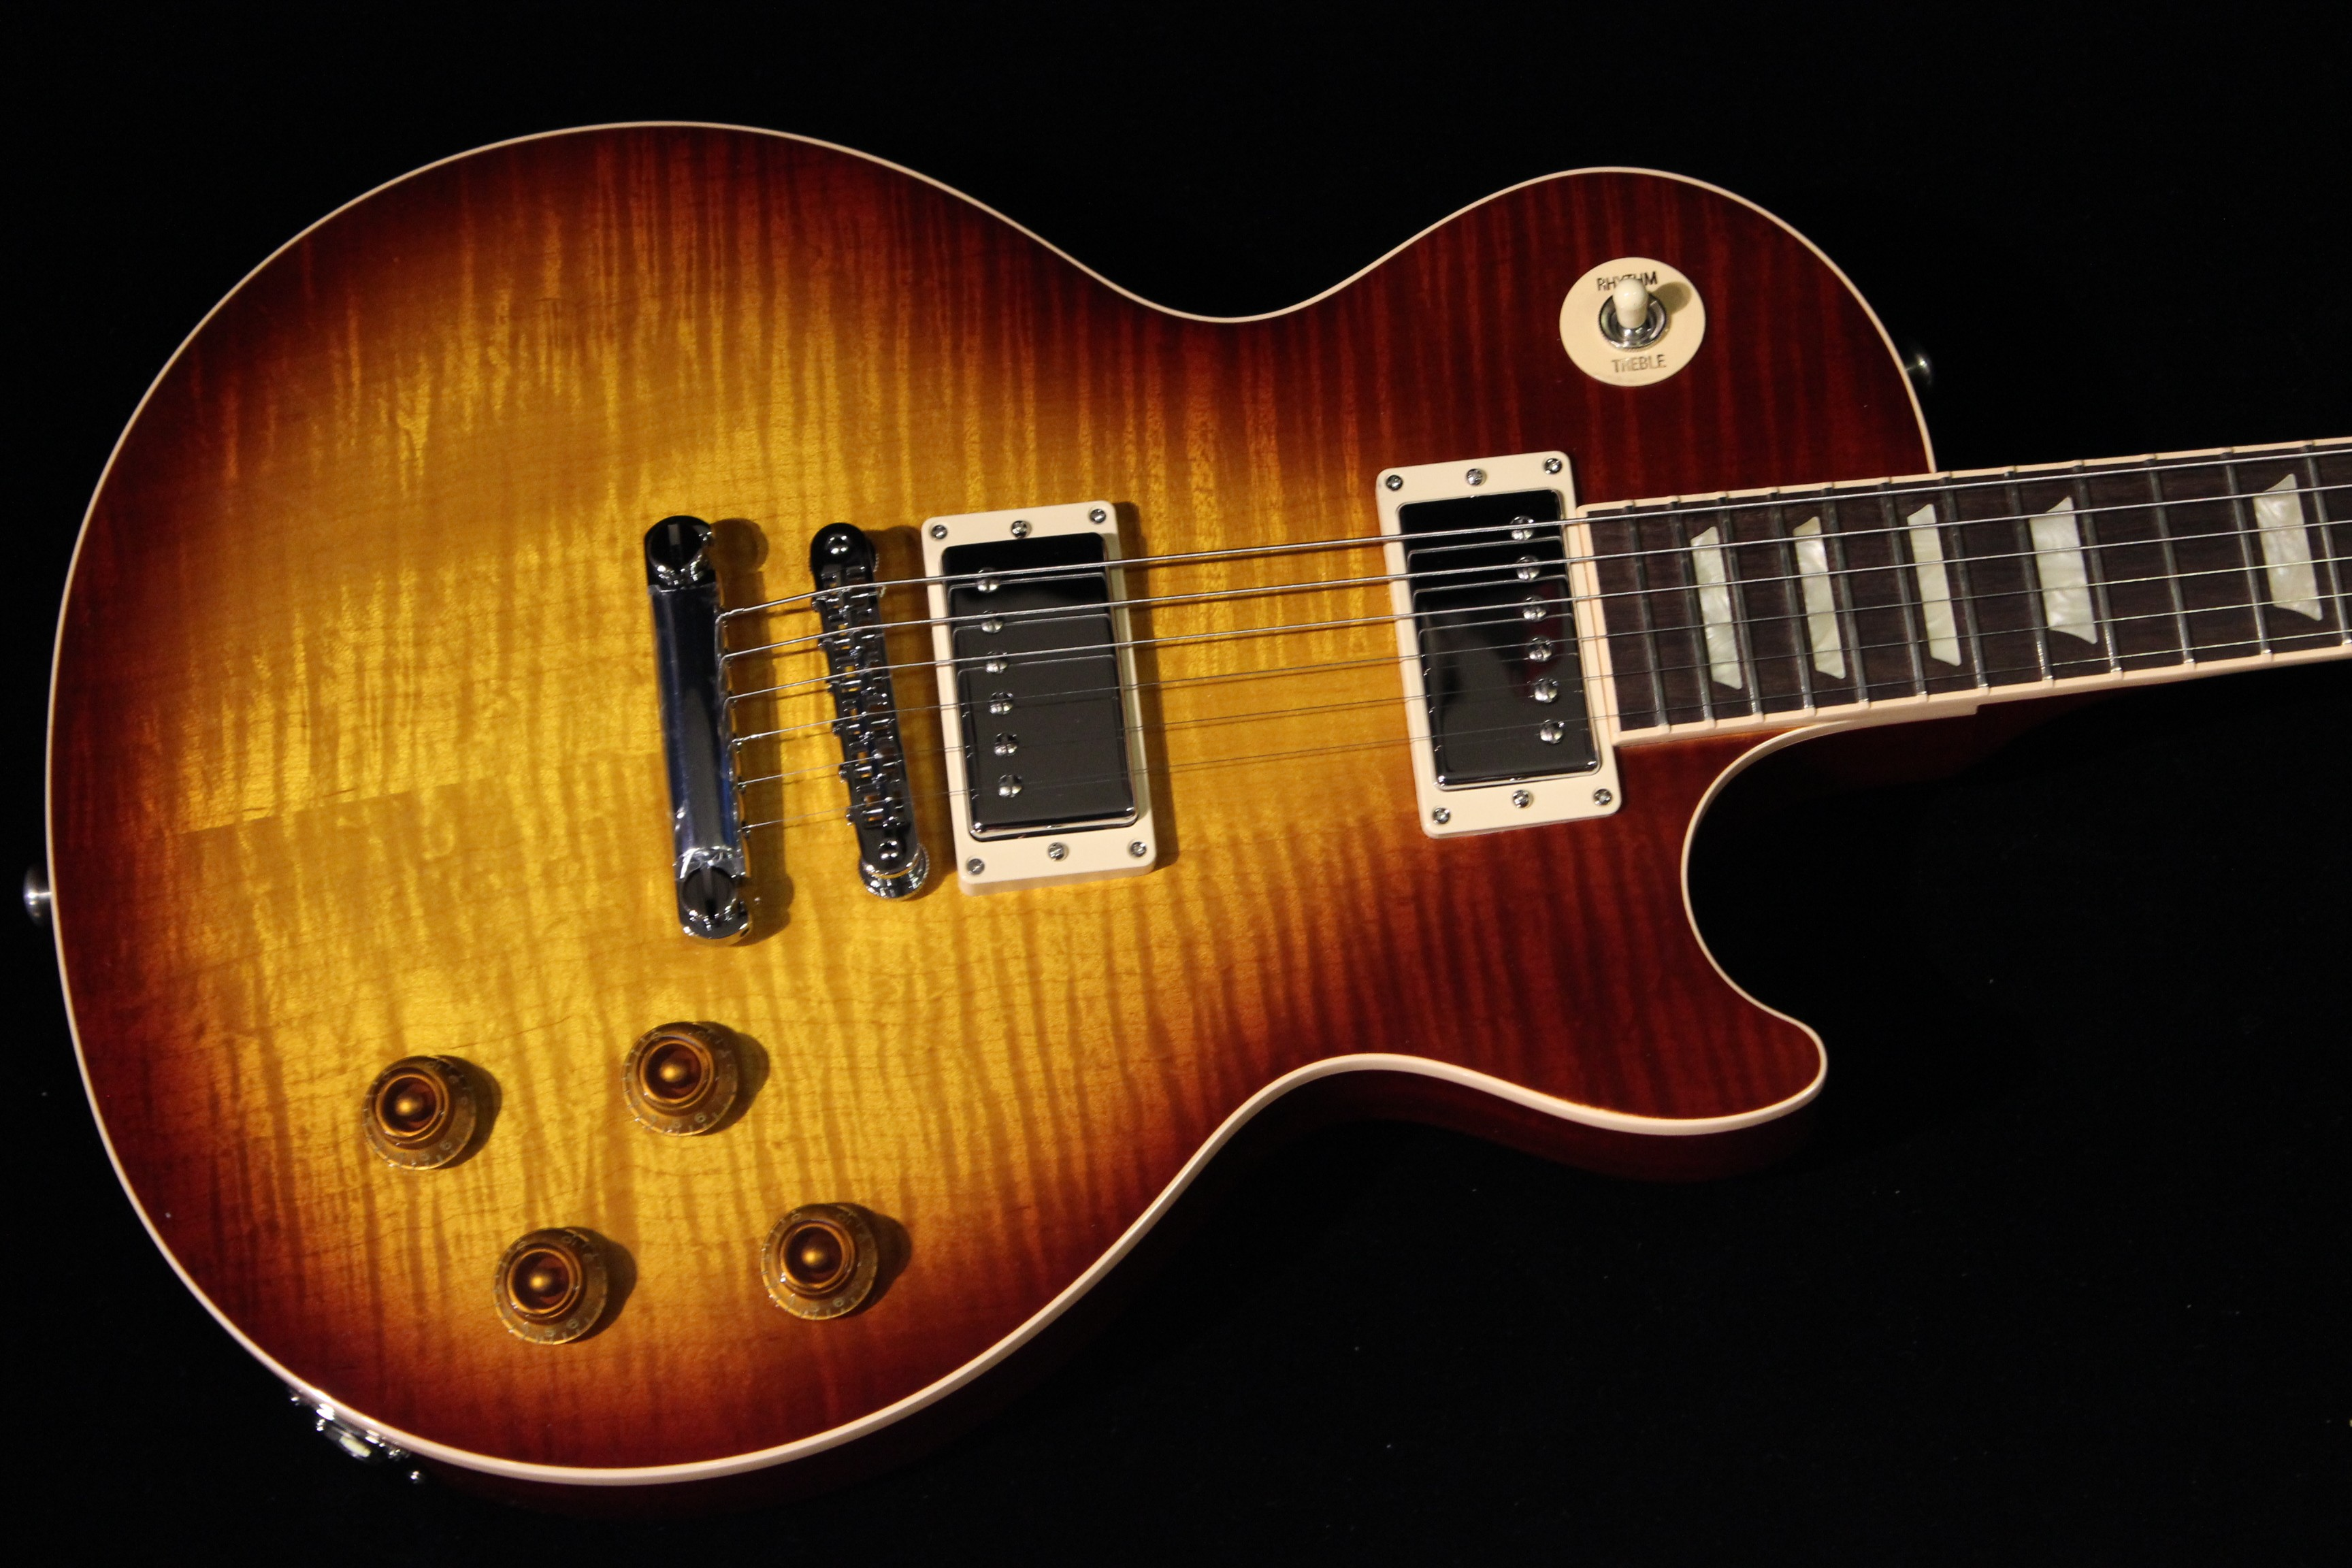 gibson les paul standard t 2016 tea burst sn 160013719 gino guitars. Black Bedroom Furniture Sets. Home Design Ideas